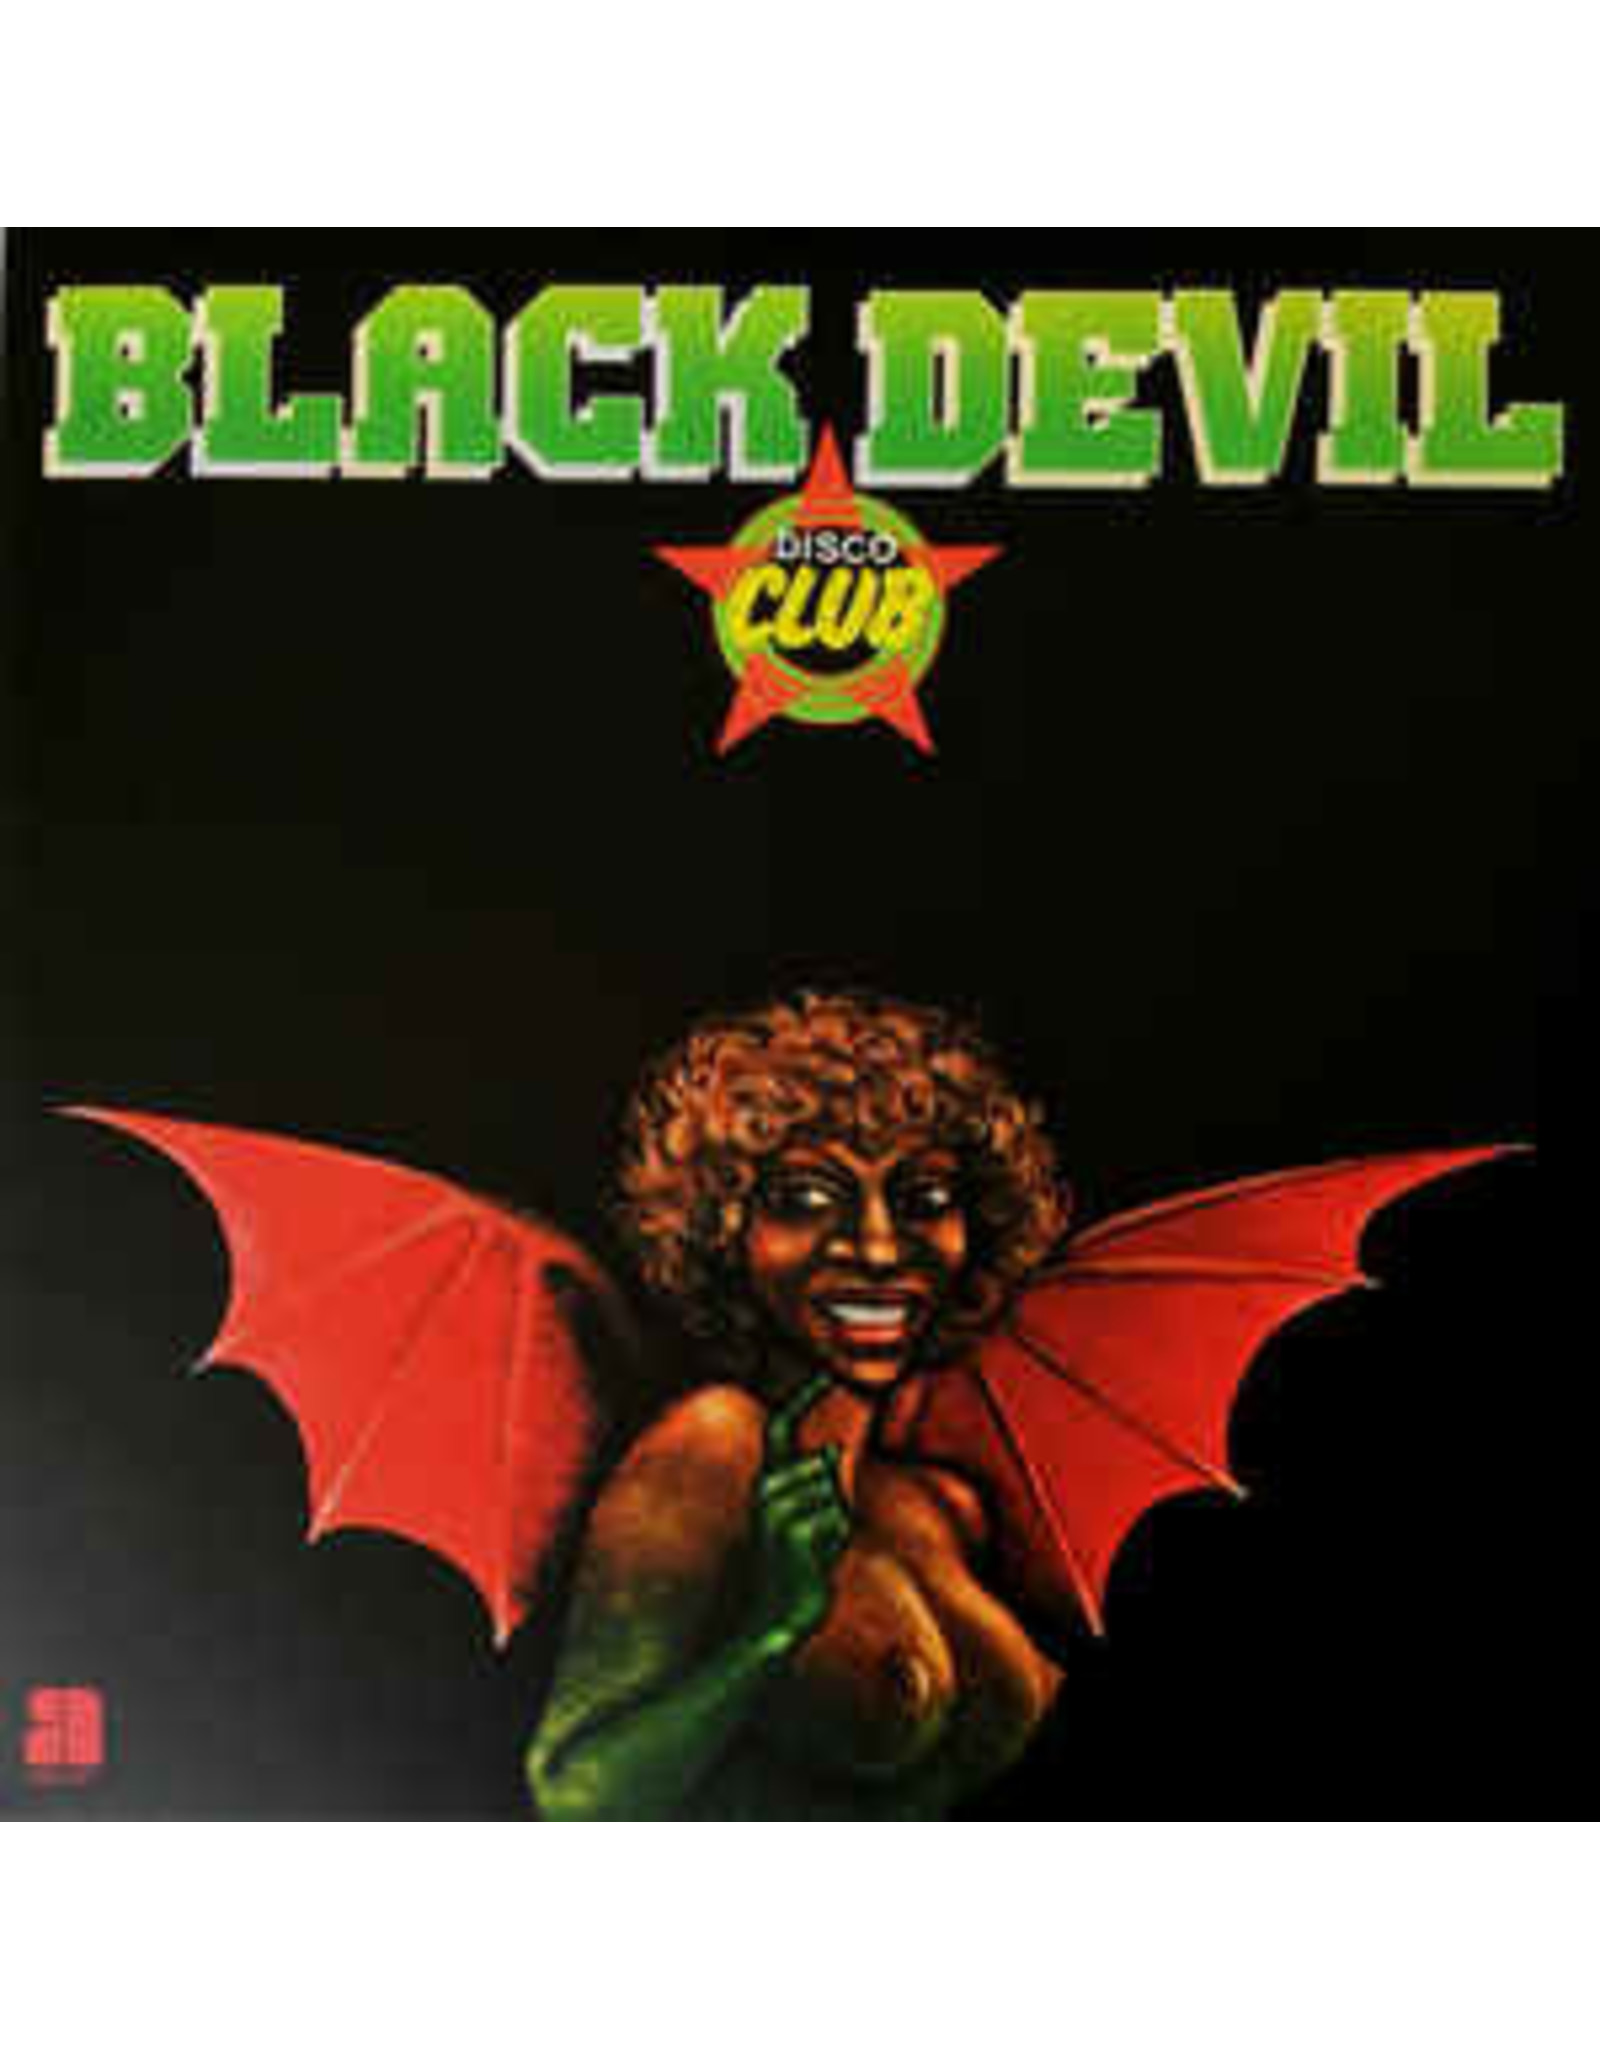 New Vinyl Black Devil Disco Club - S/T LP